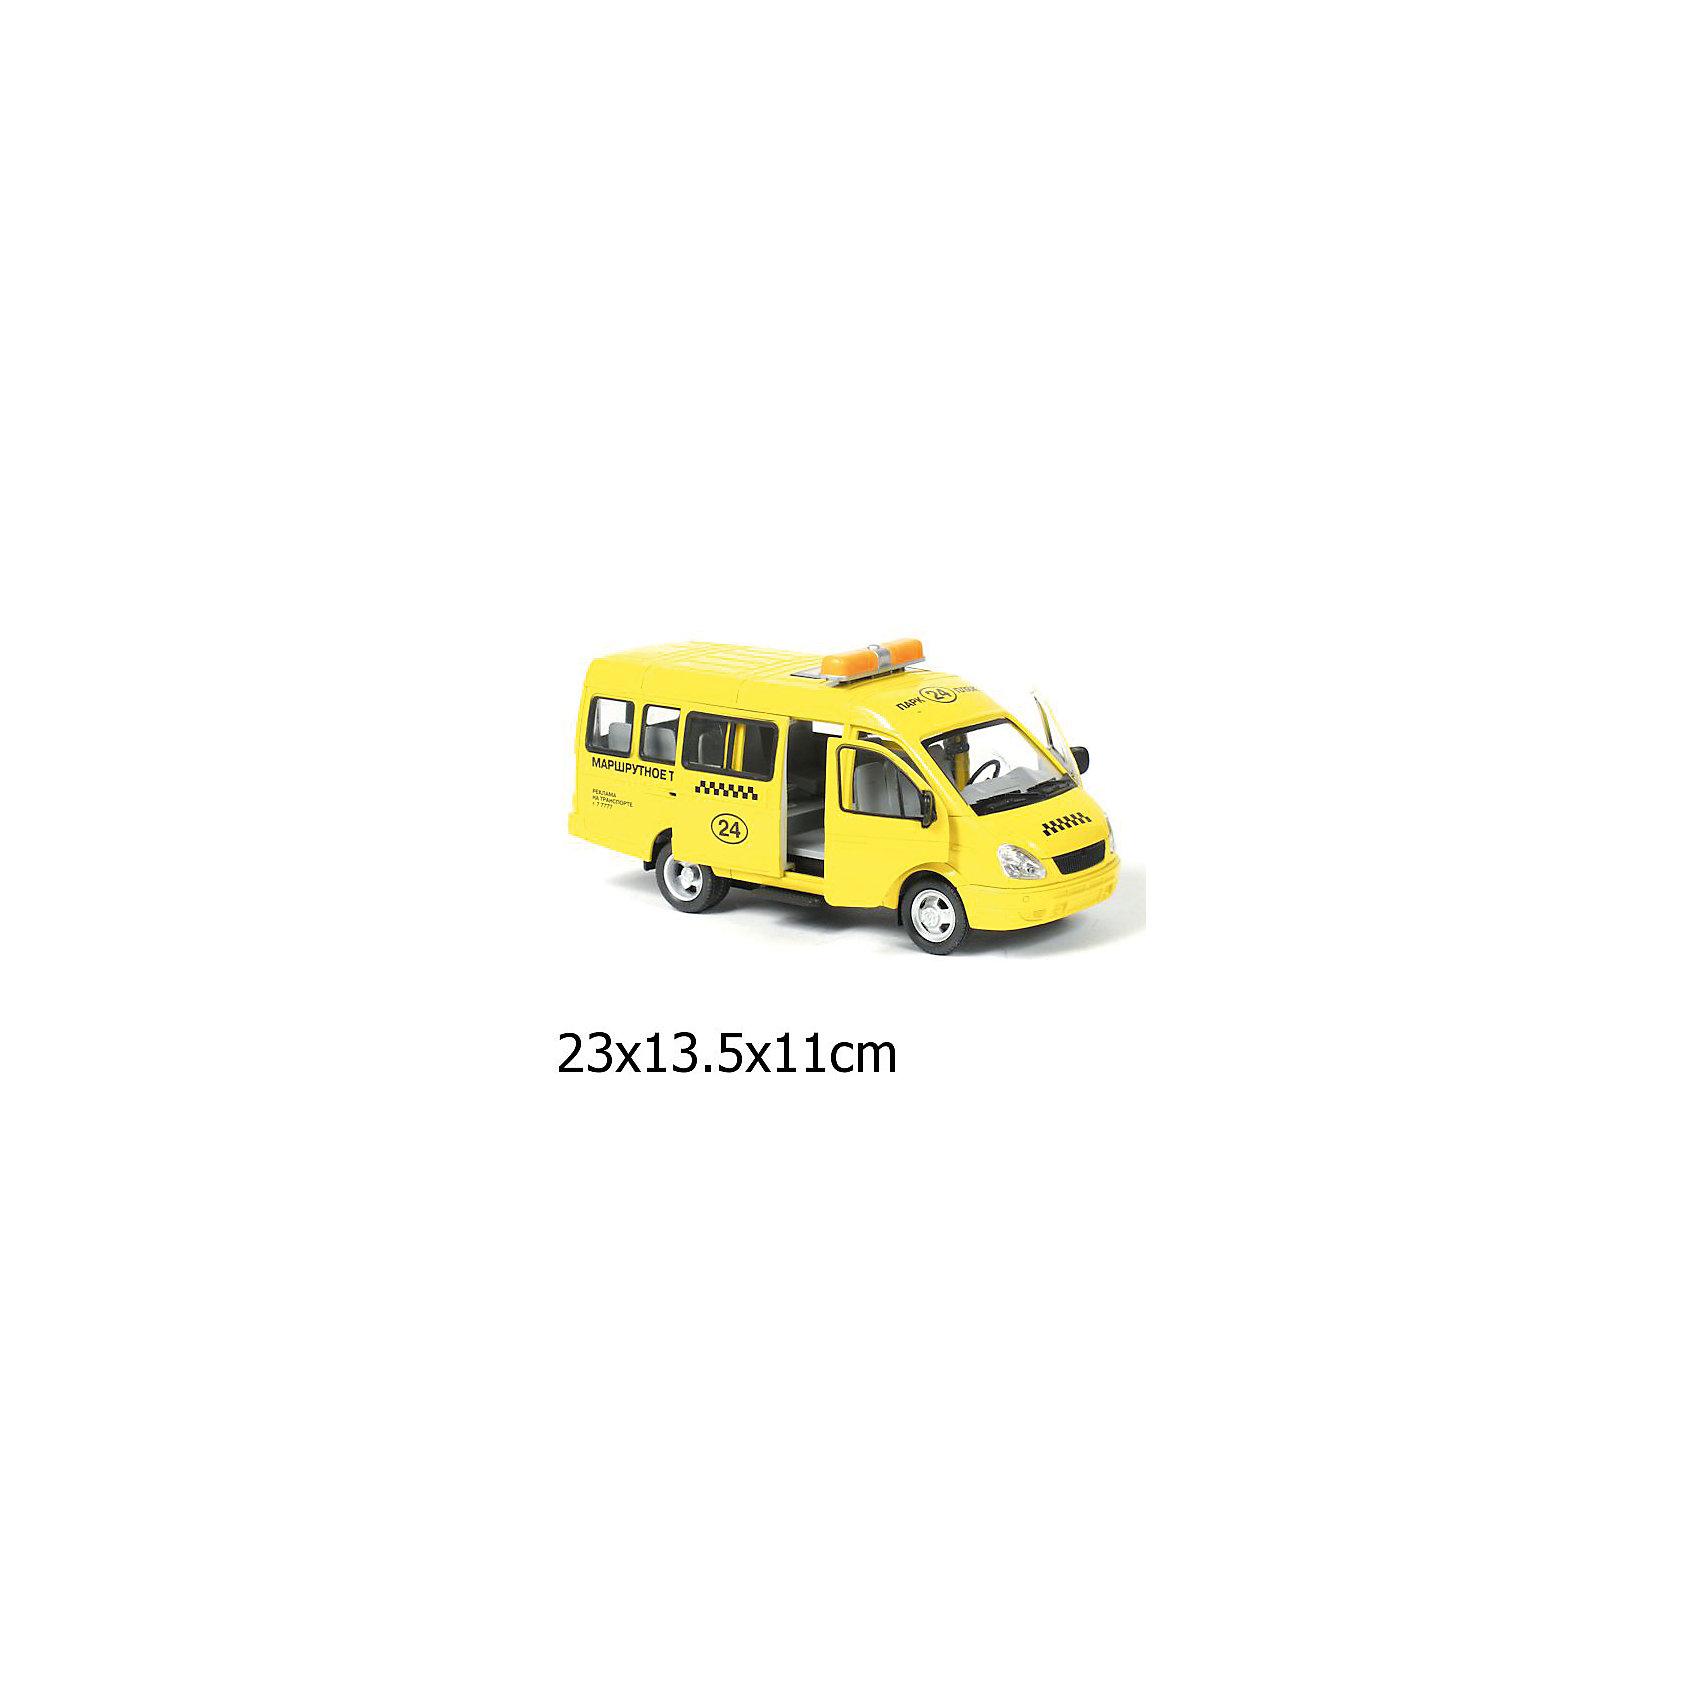 Машина Газель Такси, свет+звук, ТЕХНОПАРКМашинки<br>Машина Технопарк инерционная Газель Такси, свет+звук, открываются двери.<br><br>Ширина мм: 110<br>Глубина мм: 150<br>Высота мм: 260<br>Вес г: 450<br>Возраст от месяцев: 36<br>Возраст до месяцев: 84<br>Пол: Мужской<br>Возраст: Детский<br>SKU: 5420383